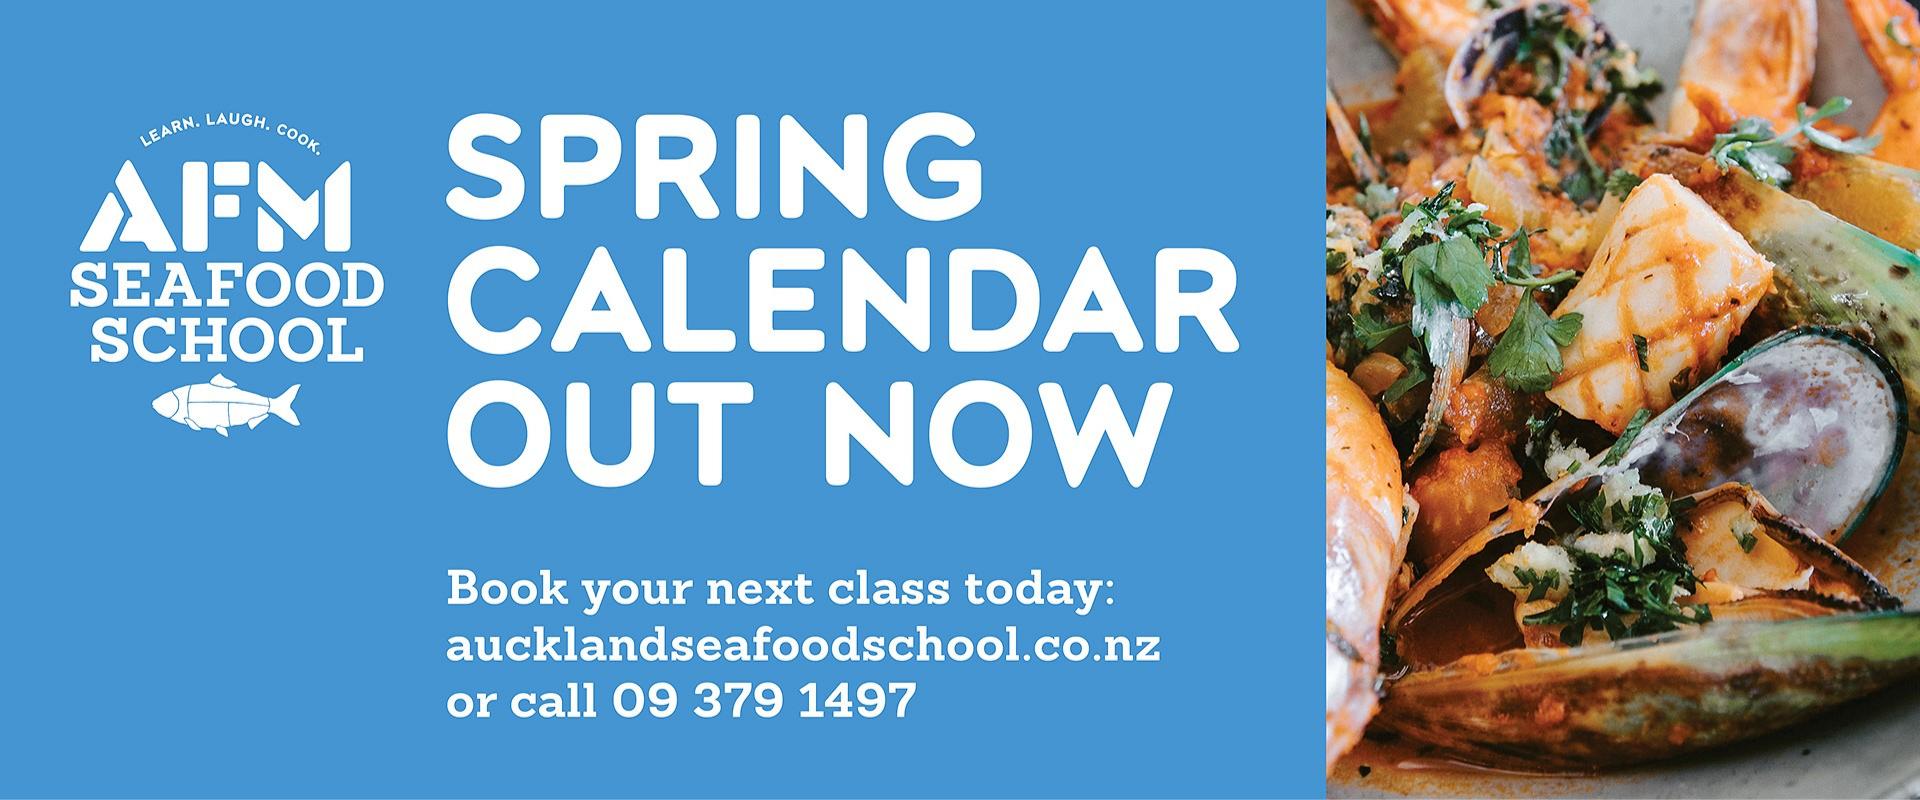 Spring Calendar - Seafood School